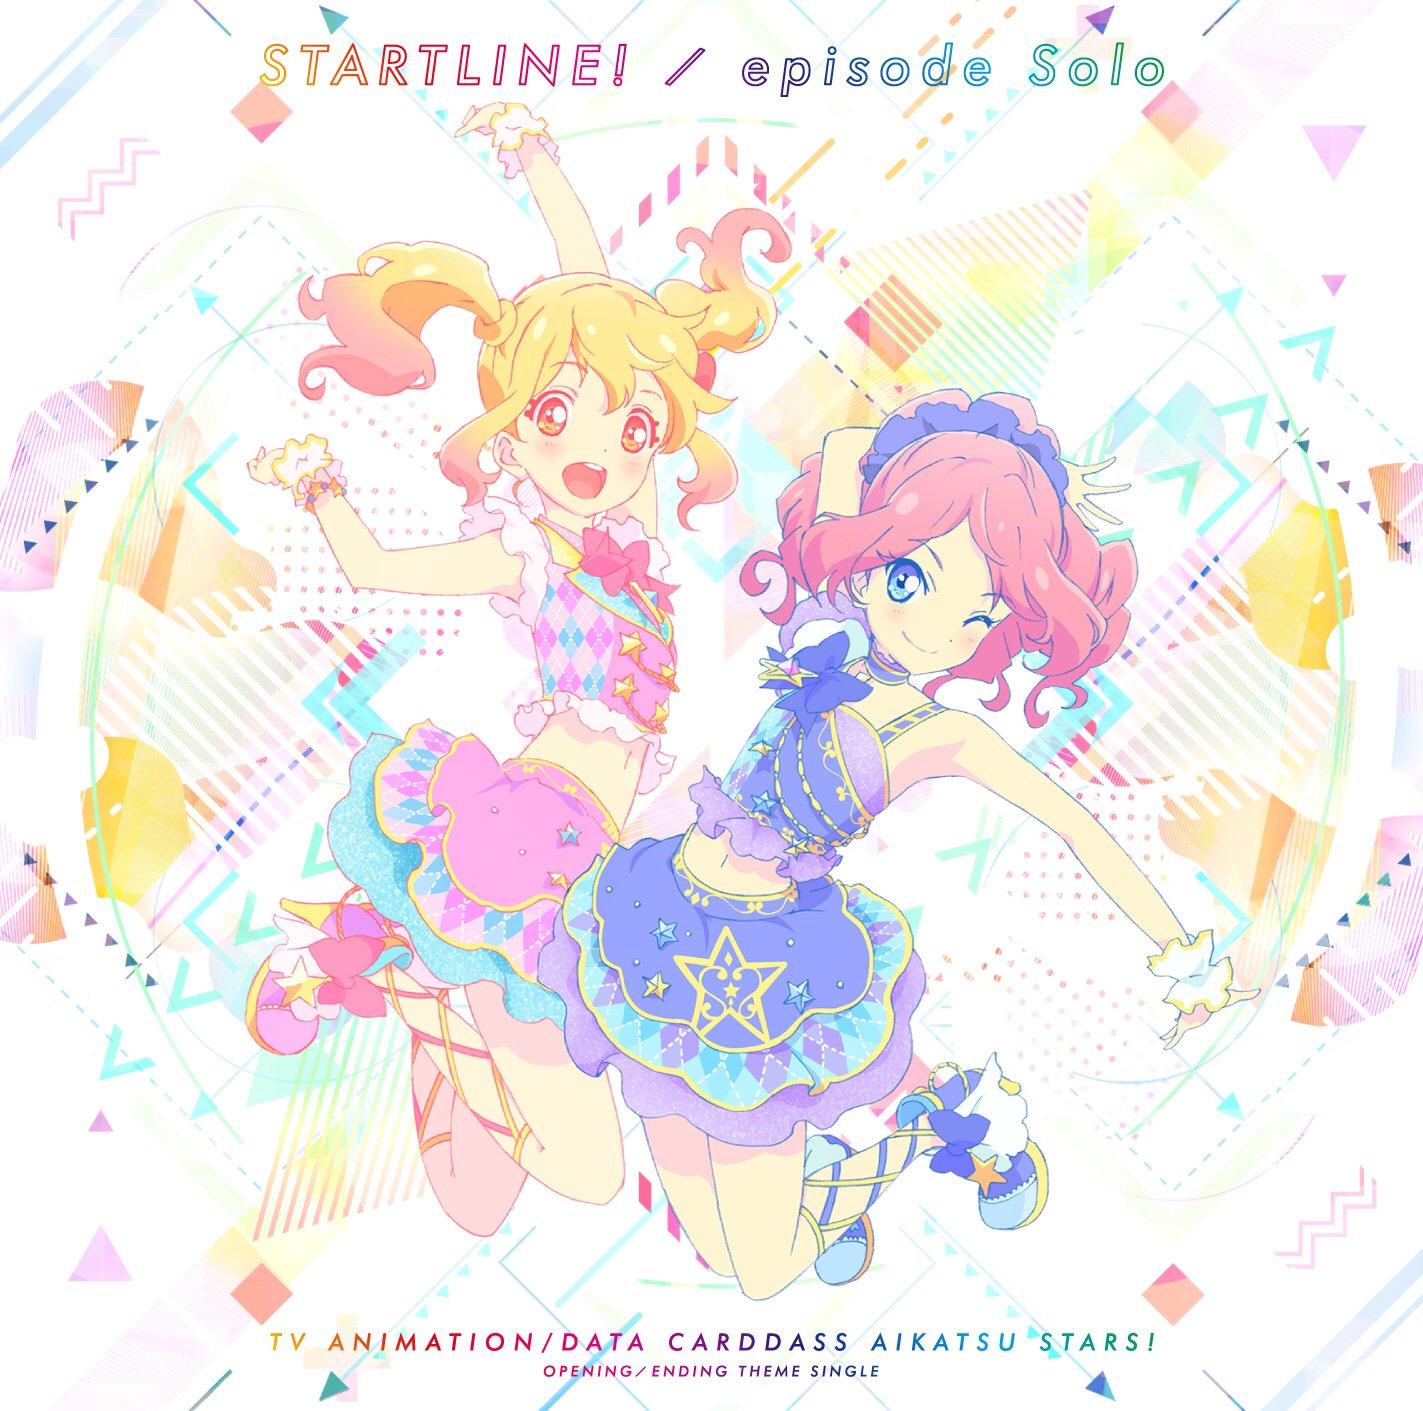 aikatsu stars start line episode solo